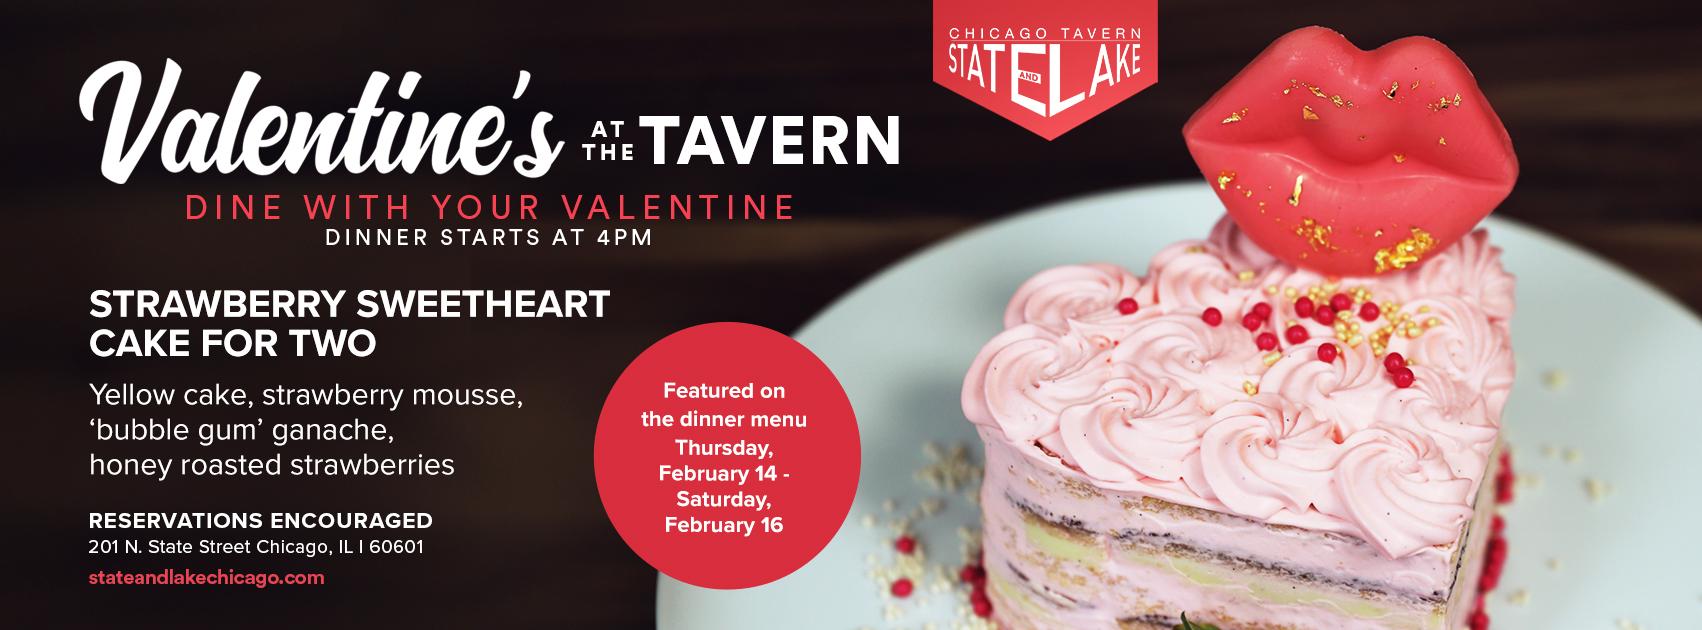 StateandLake_Valentine'sDay2019_FBCover